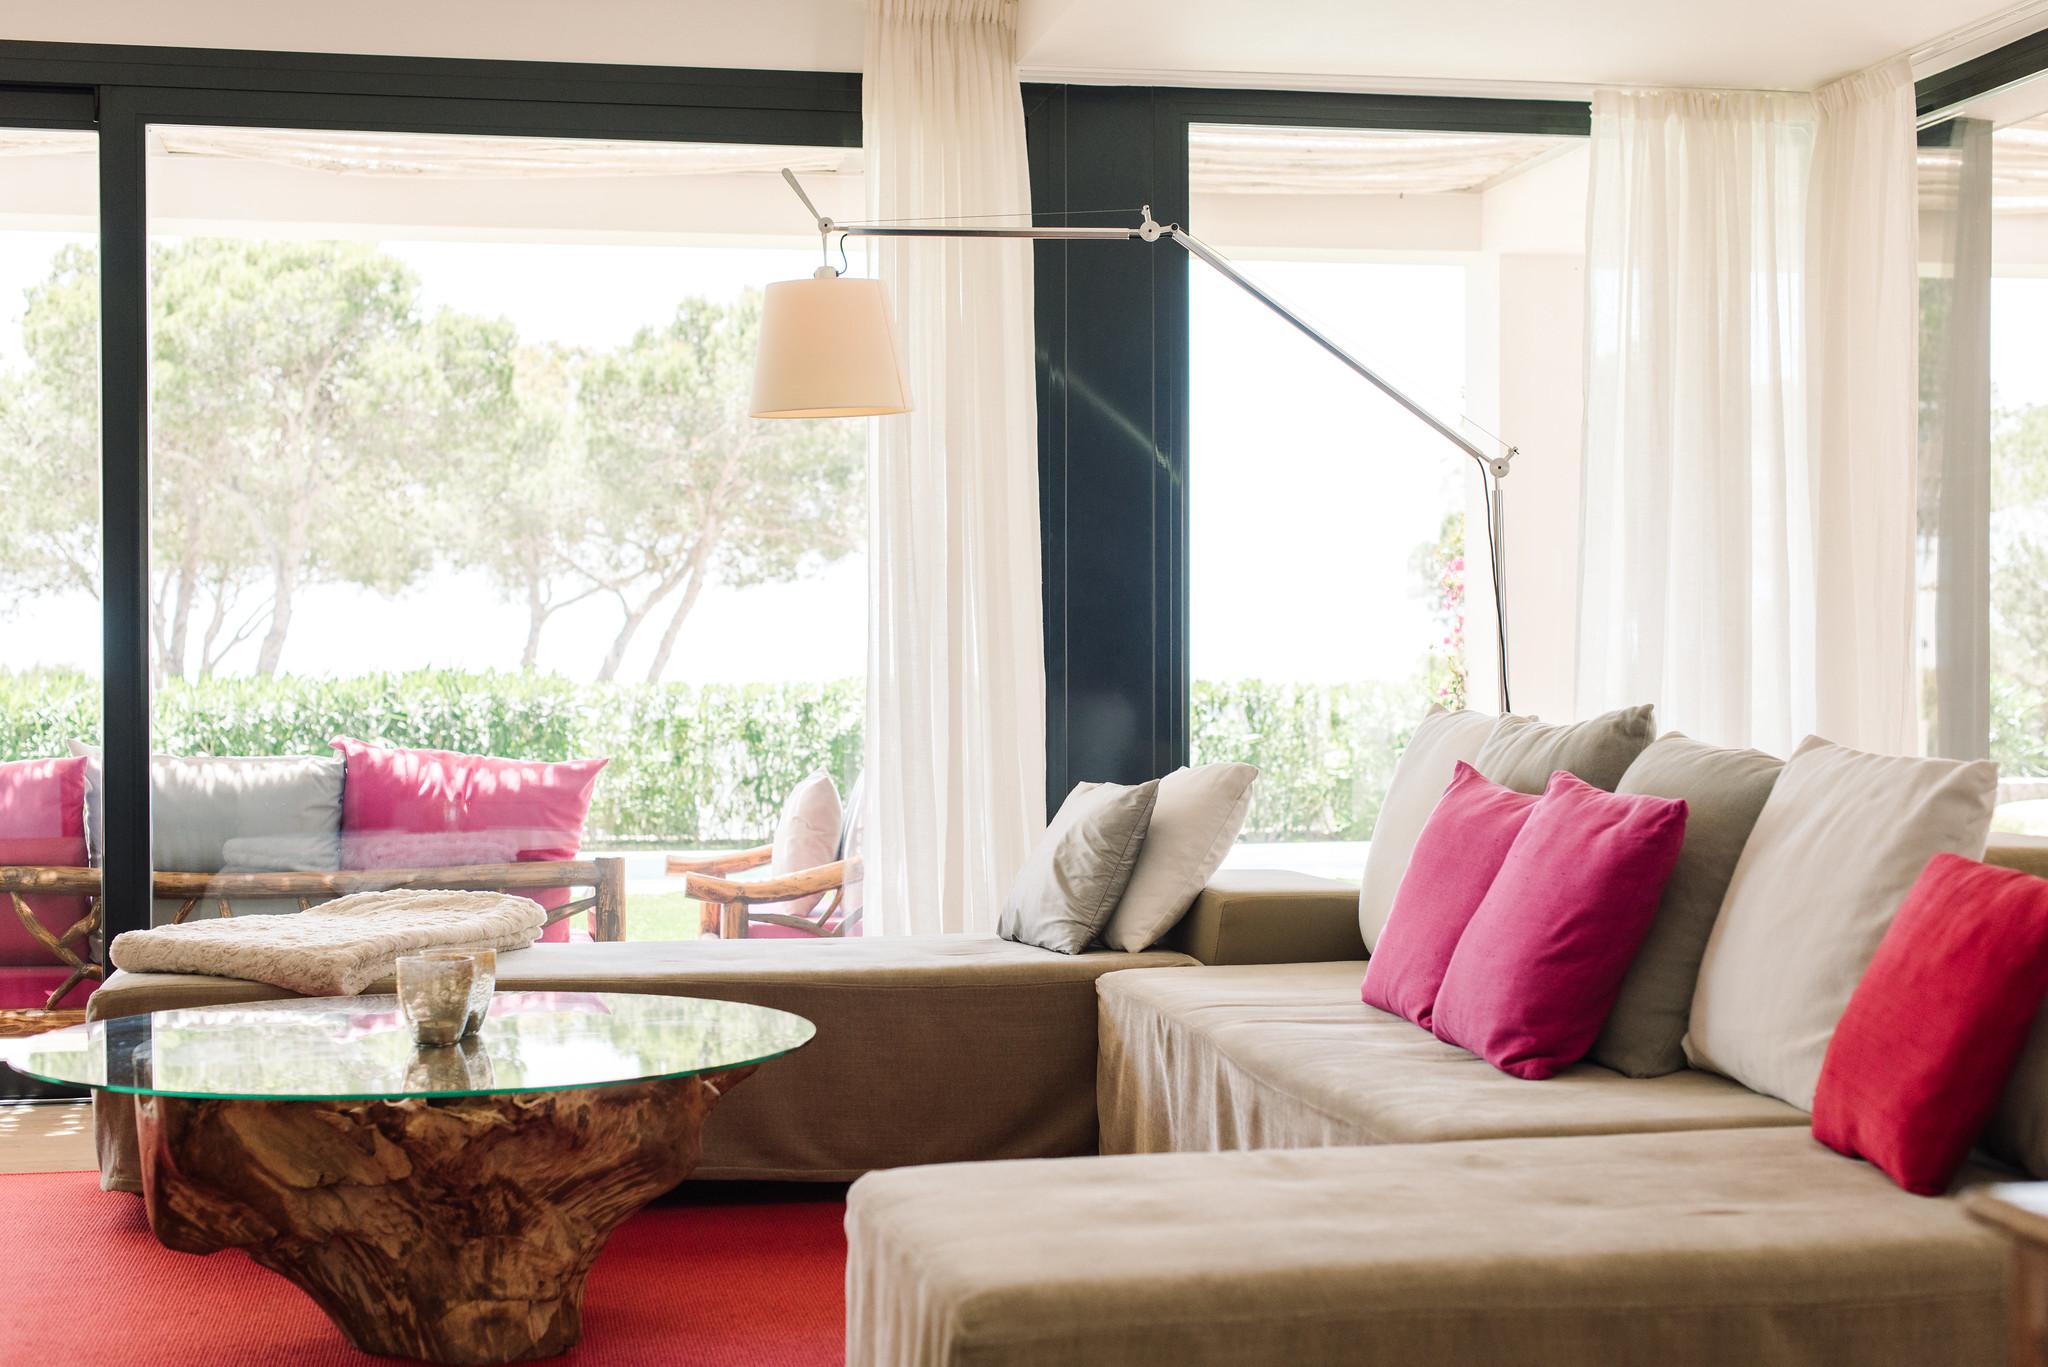 https://www.white-ibiza.com/wp-content/uploads/2020/06/white-ibiza-villas-can-jondal-interior-living-room-1.jpg